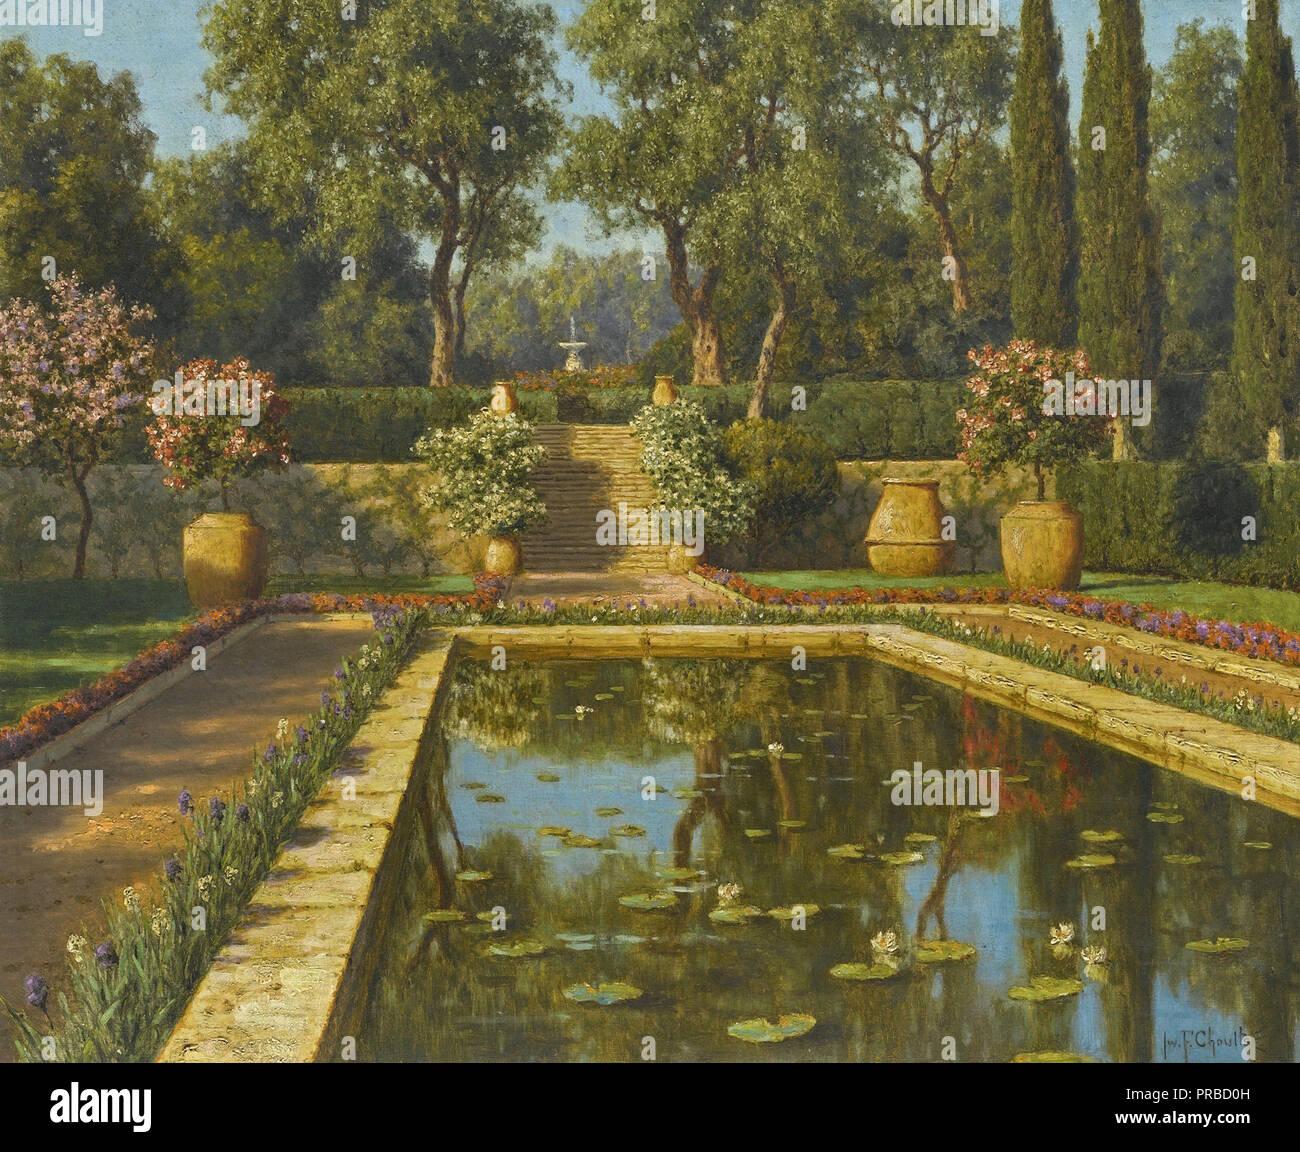 Choultse Ivan - Jardin Fleuri Nice Stock Photo: 220913185 - Alamy